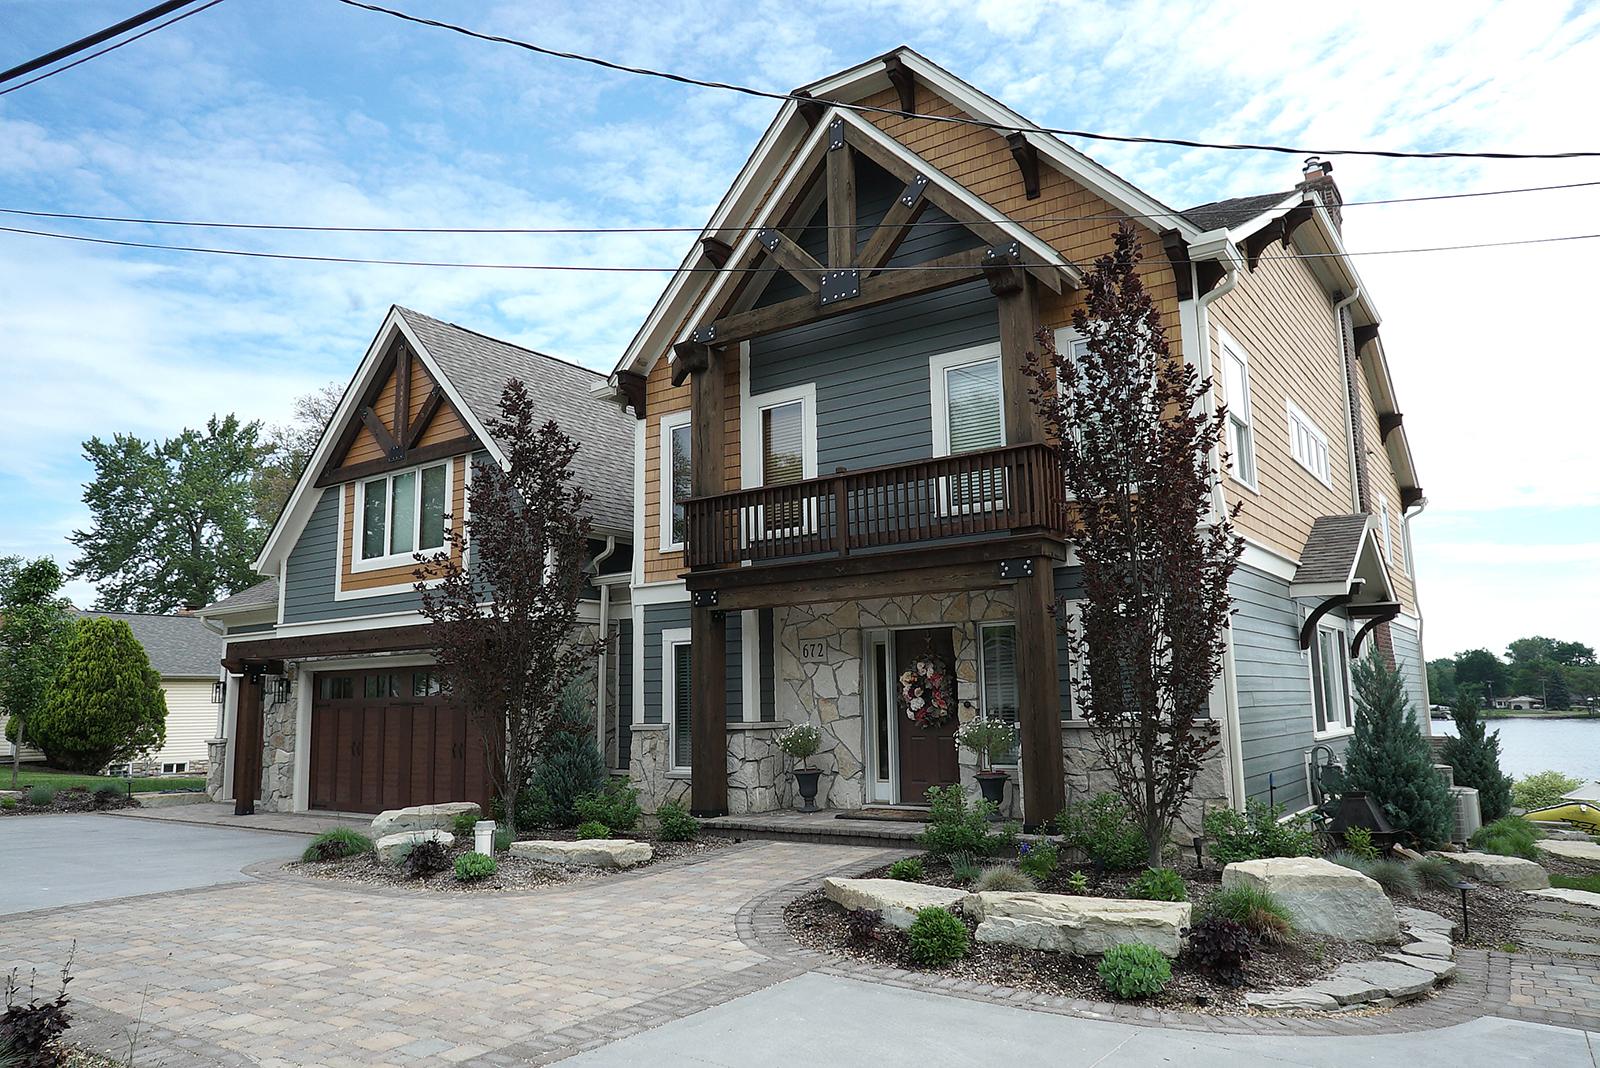 House_Front_Driveway_DSC06449.jpg